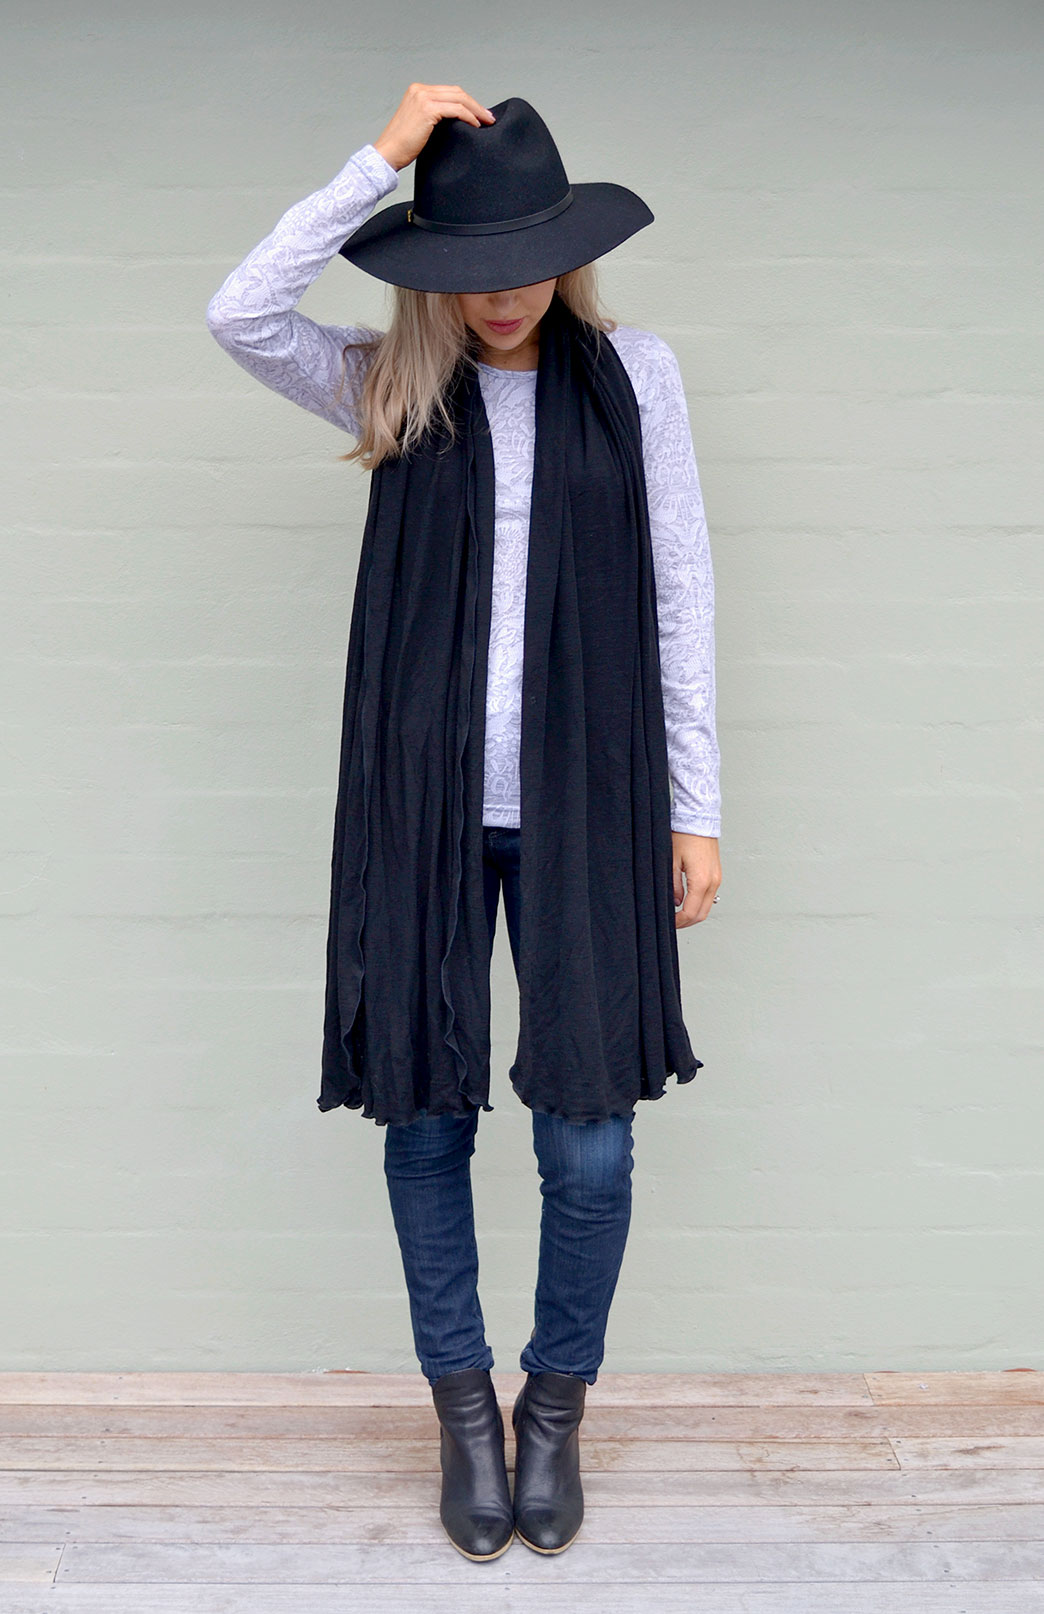 Scarves - Plain - Women's Superfine Black Merino Wool Classic Wide Scarf - Smitten Merino Tasmania Australia